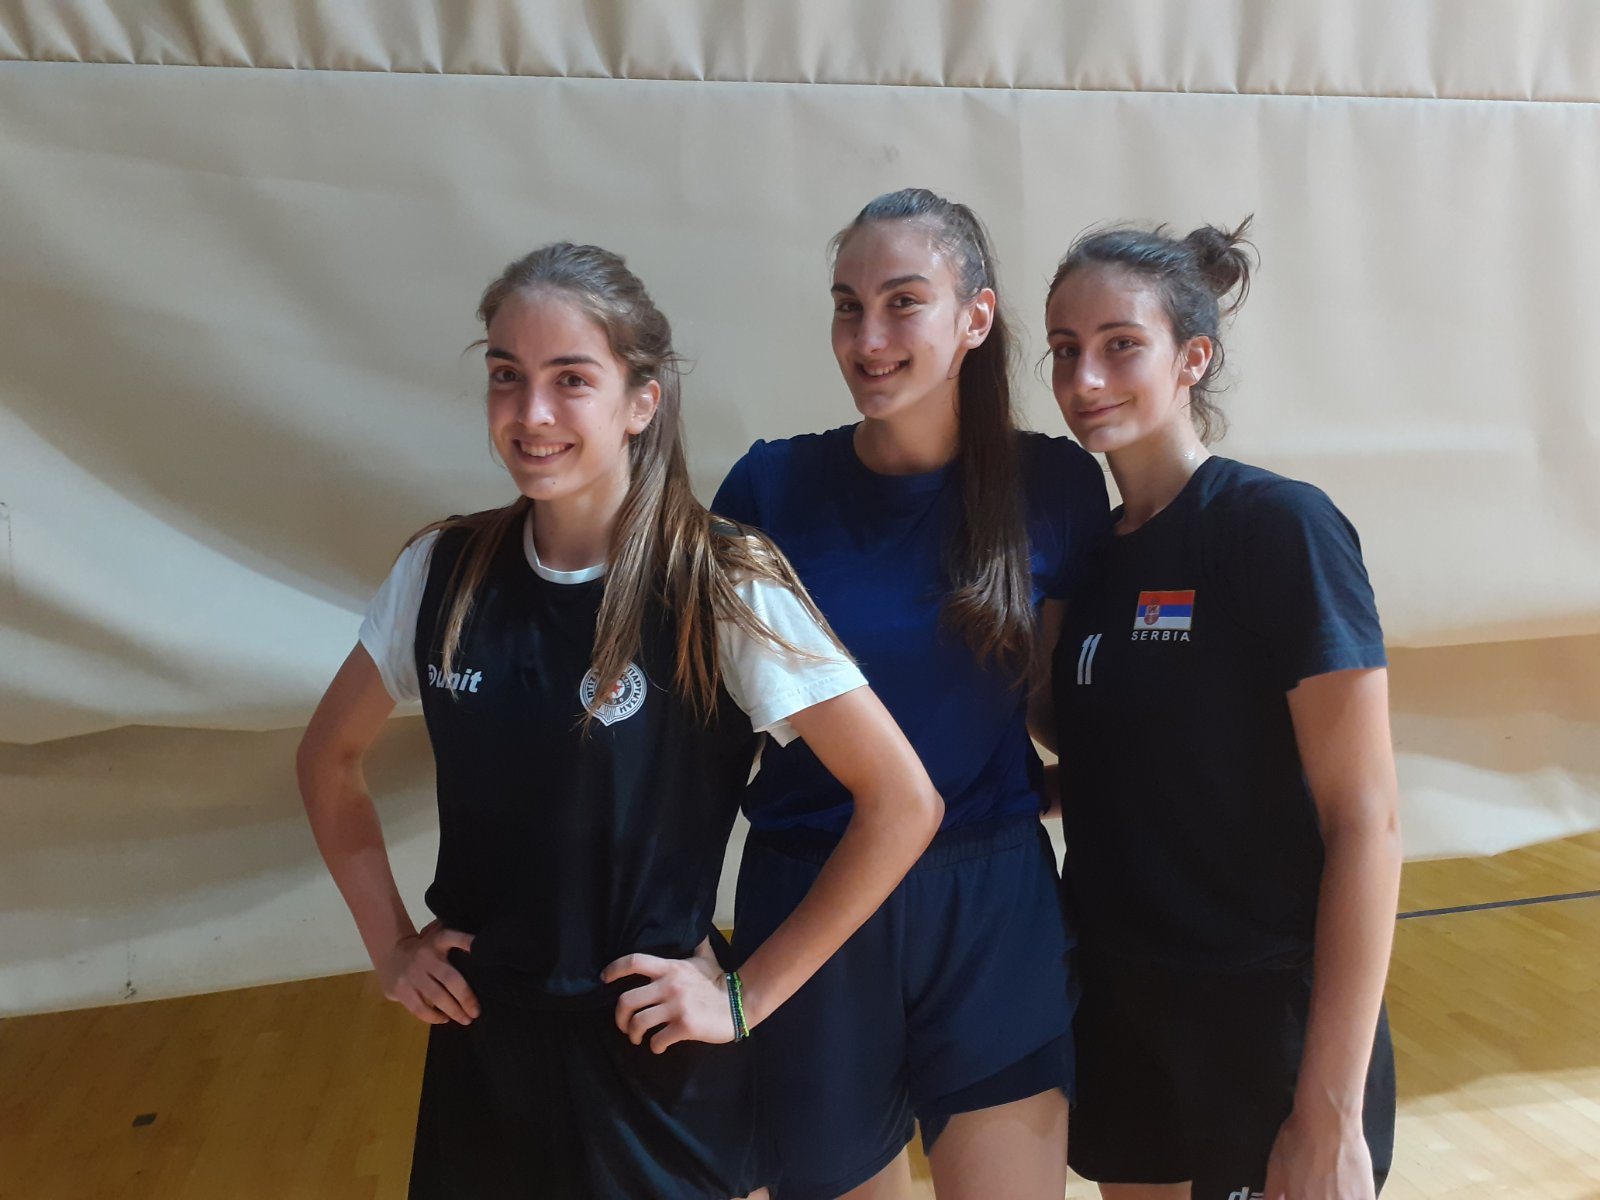 ana-drobnjak-andrea-tisma-jovana-cirkovic-juniorska-reprezentacija